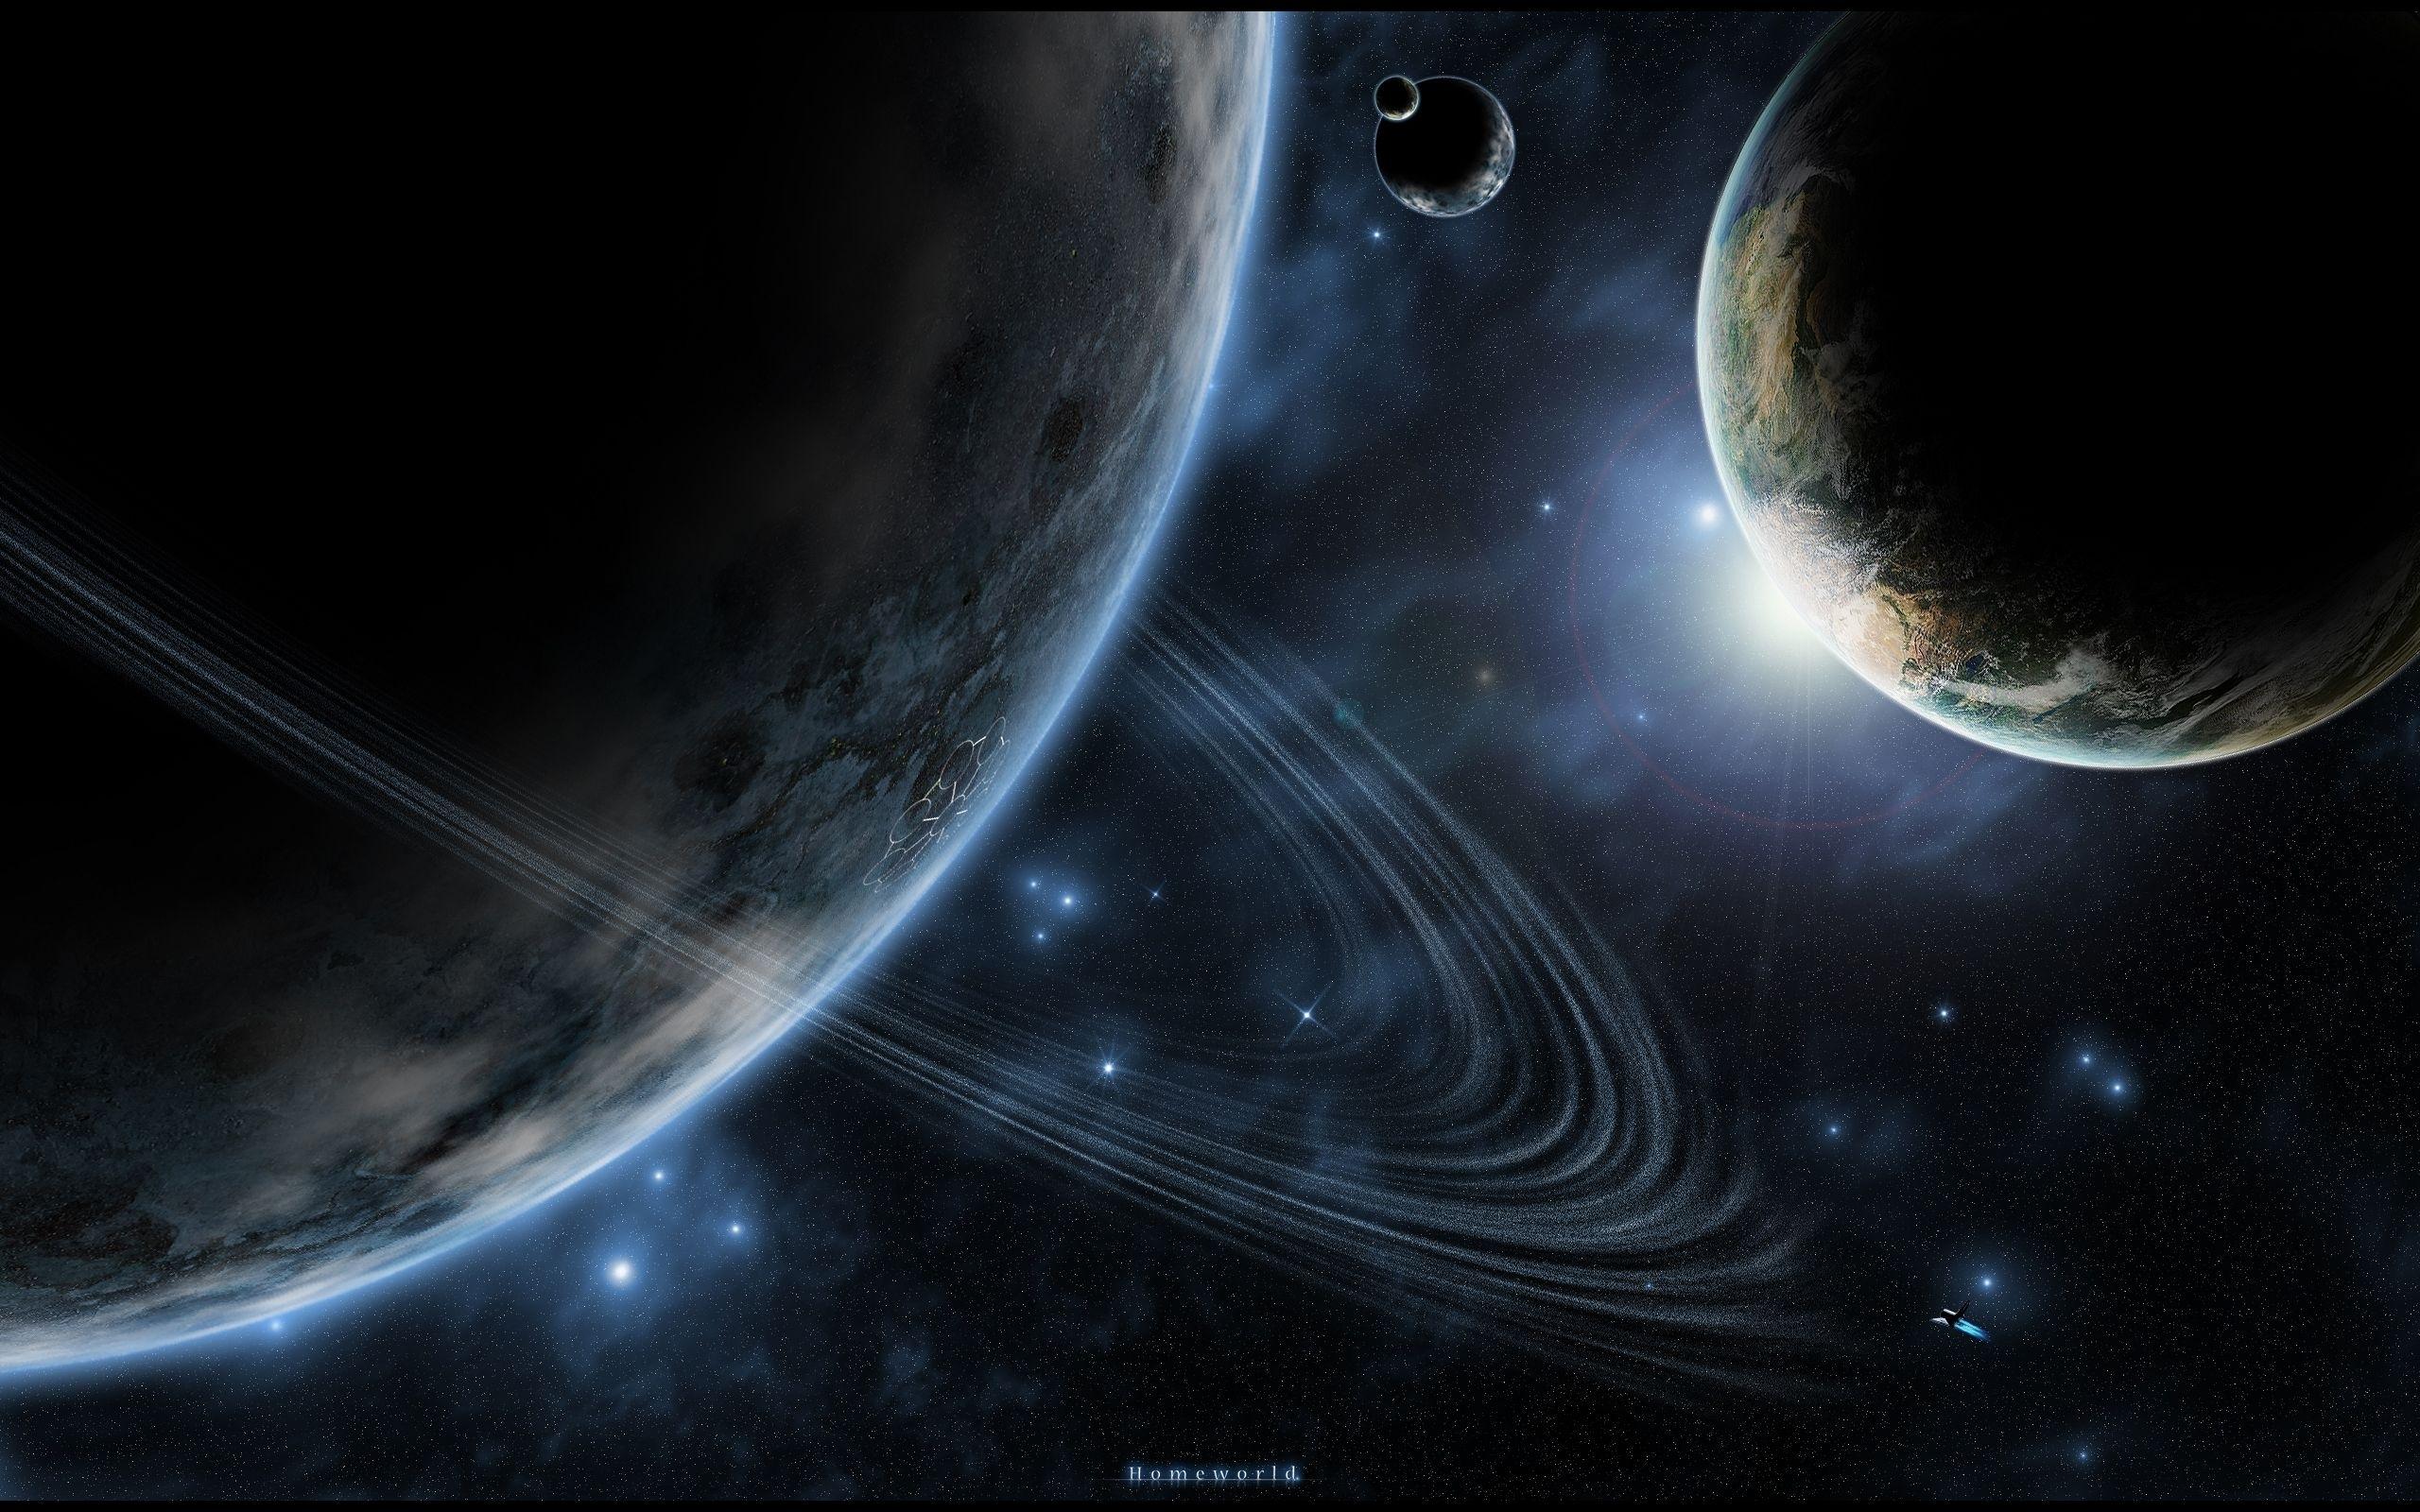 Space Art Wallpaper   Space Wallpaper 7076627 2560x1600